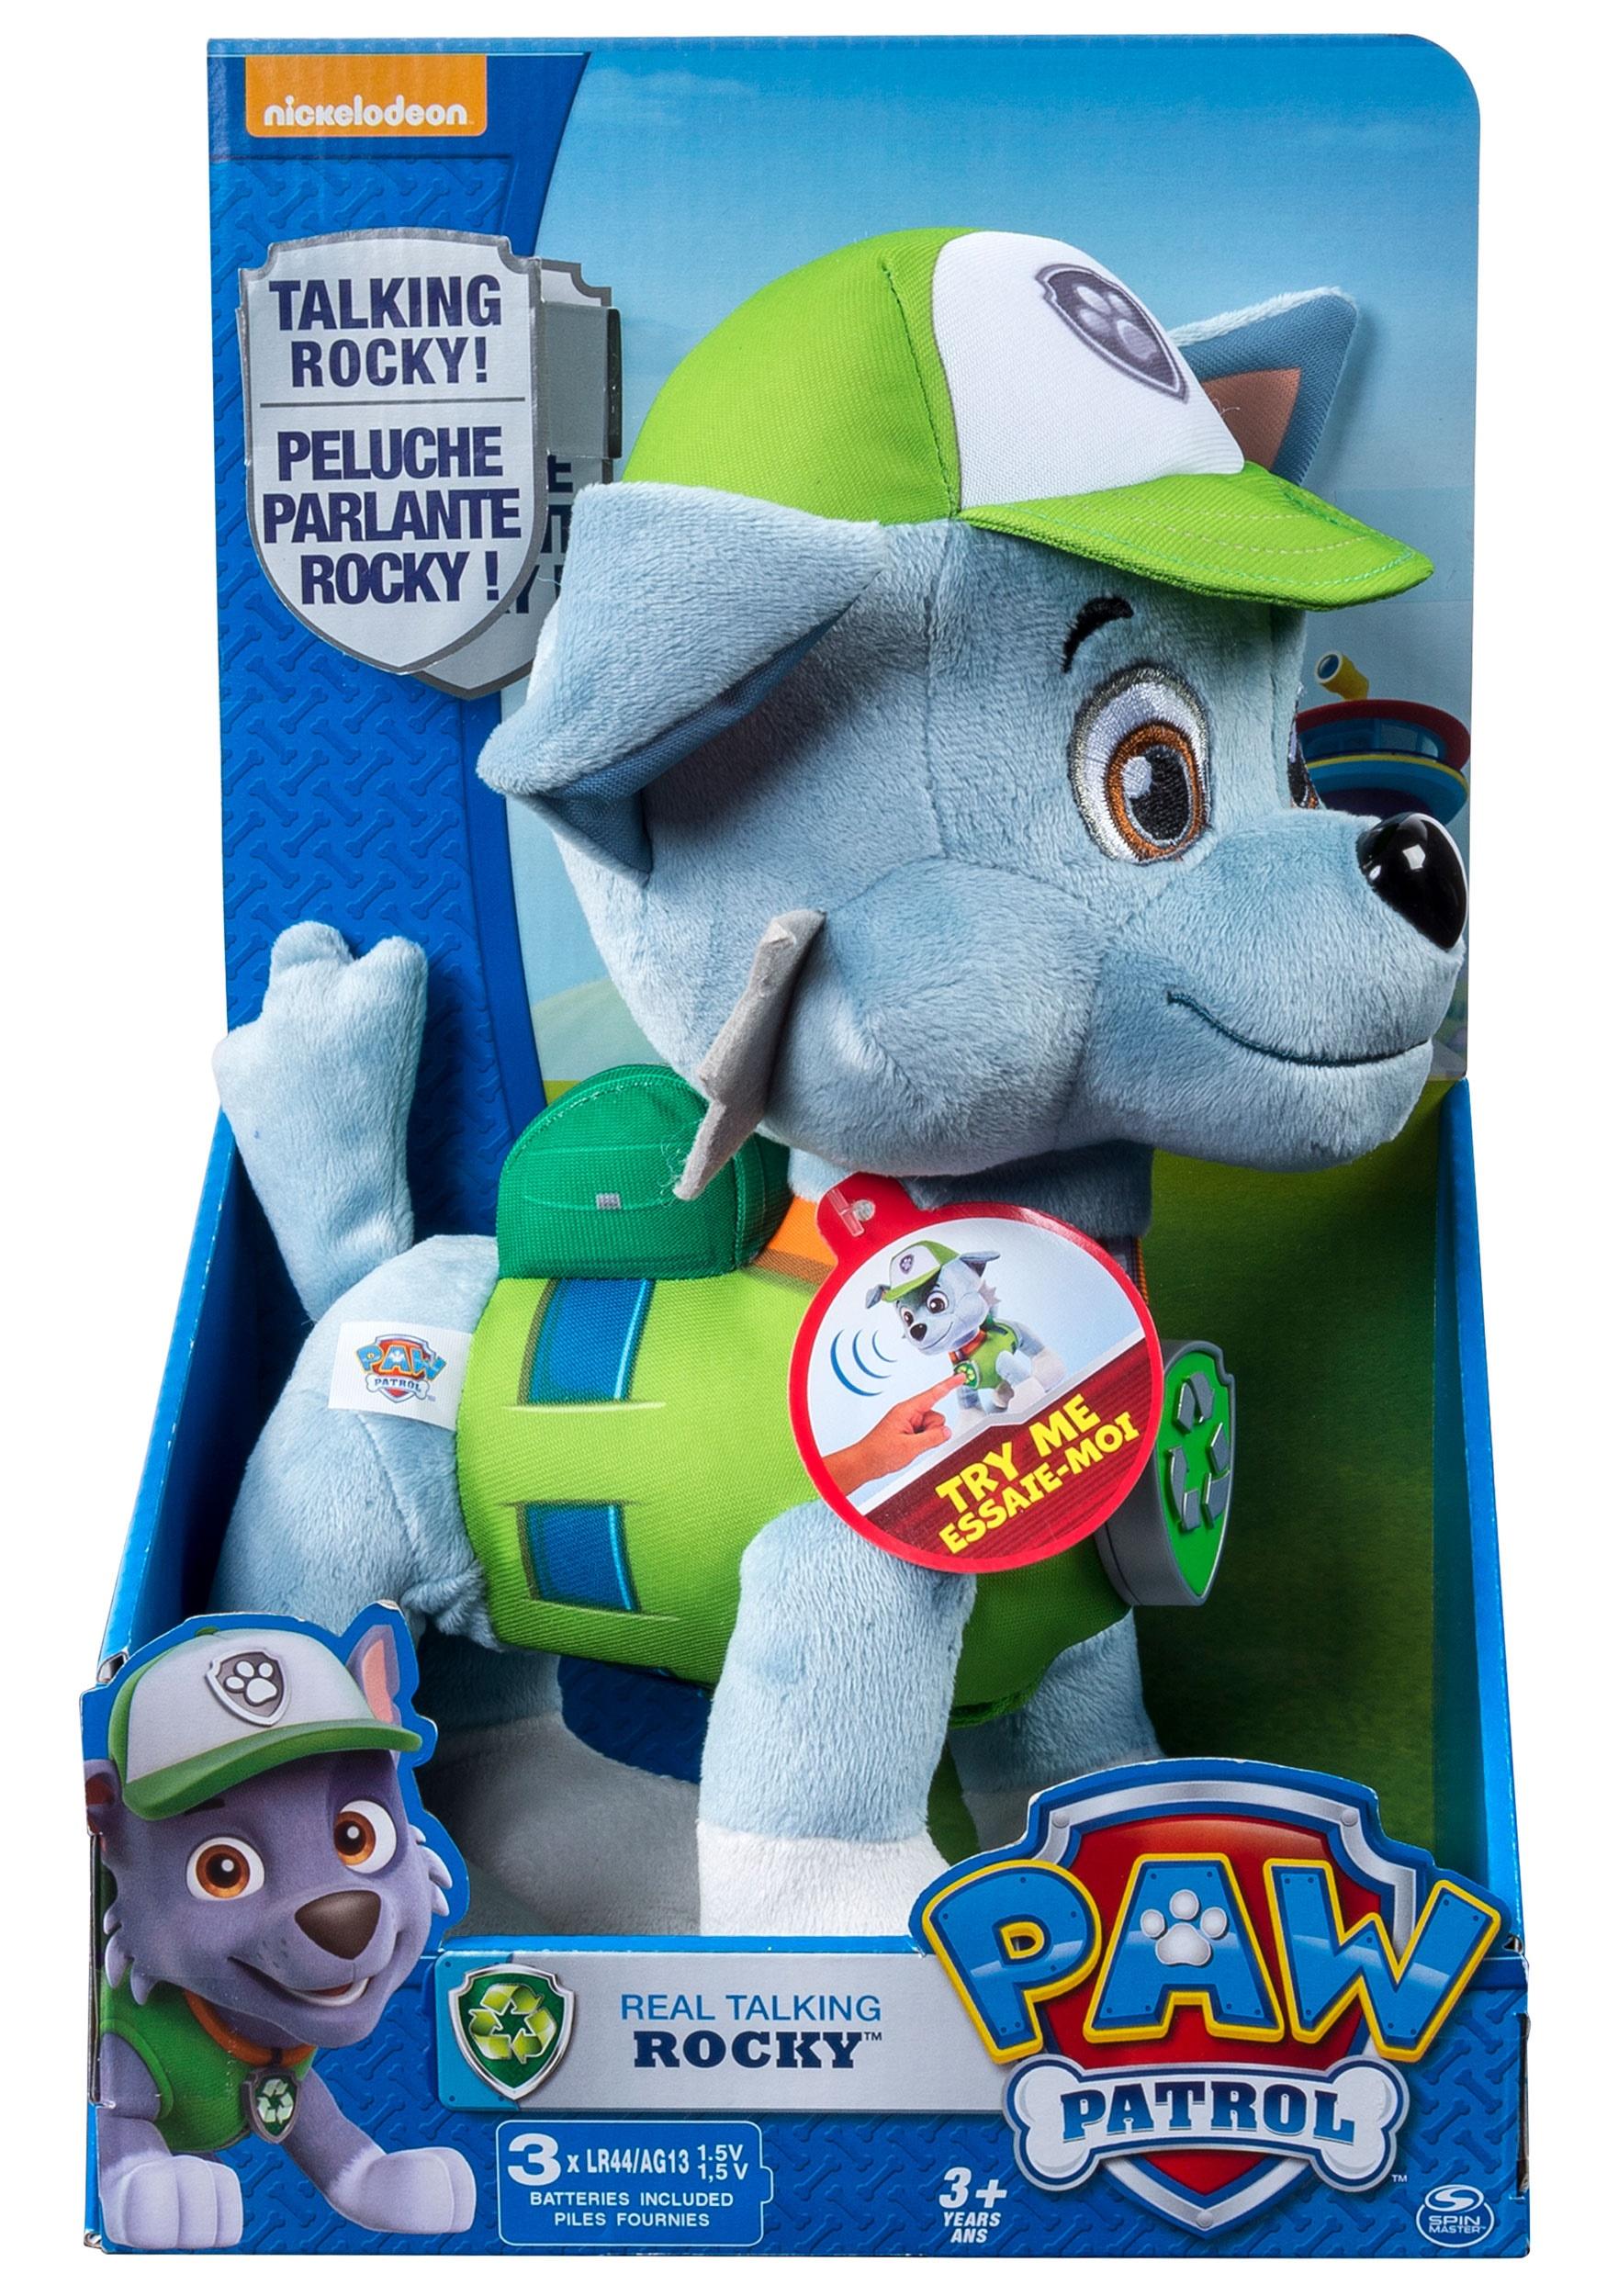 Paw Patrol Rocky Talking Stuffed Toy